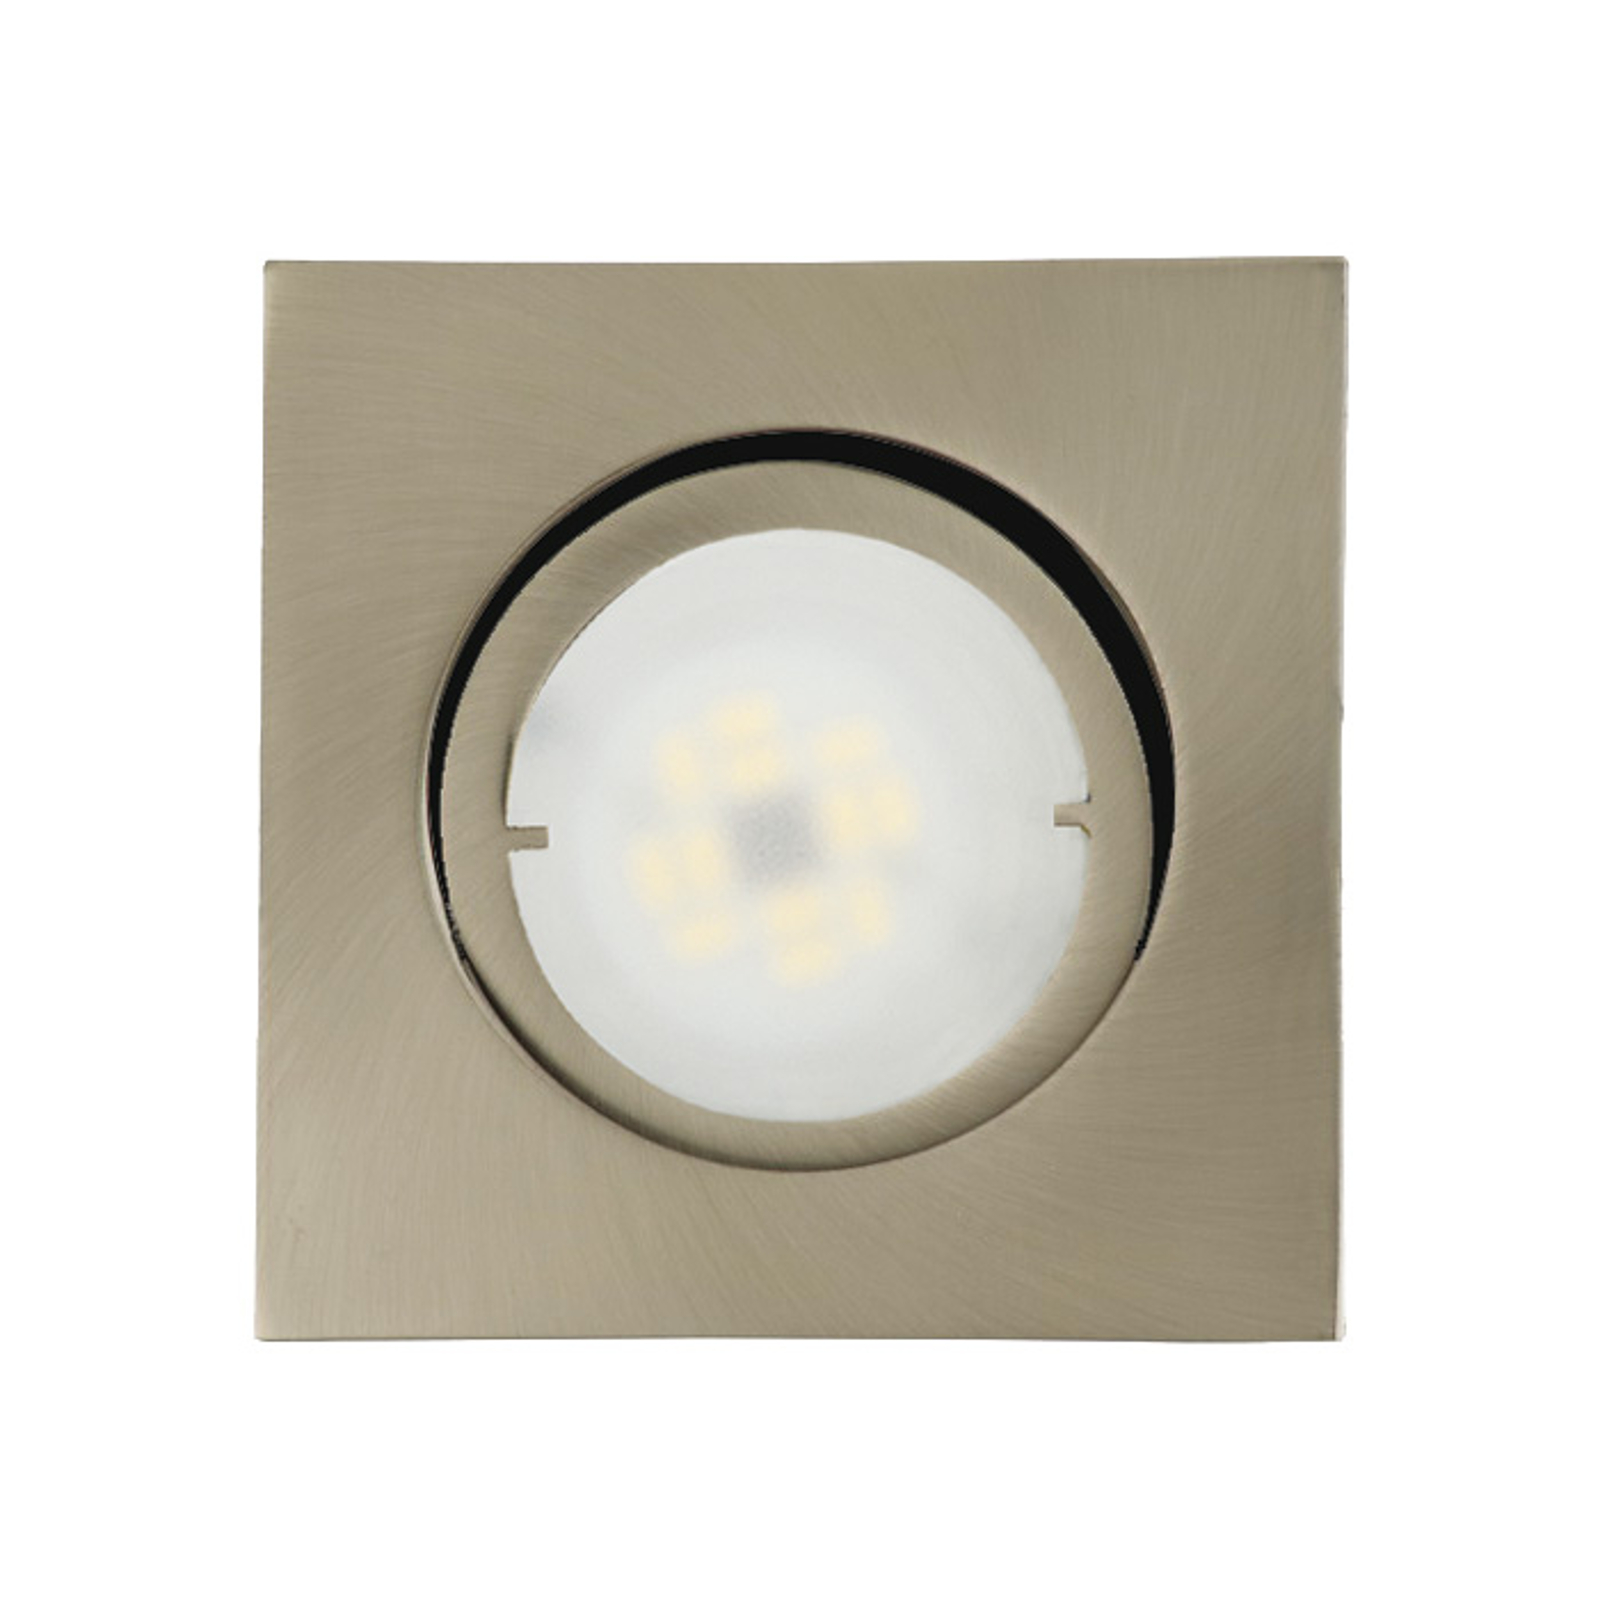 Joanie - LED-uppovalaisin, harjattu rauta